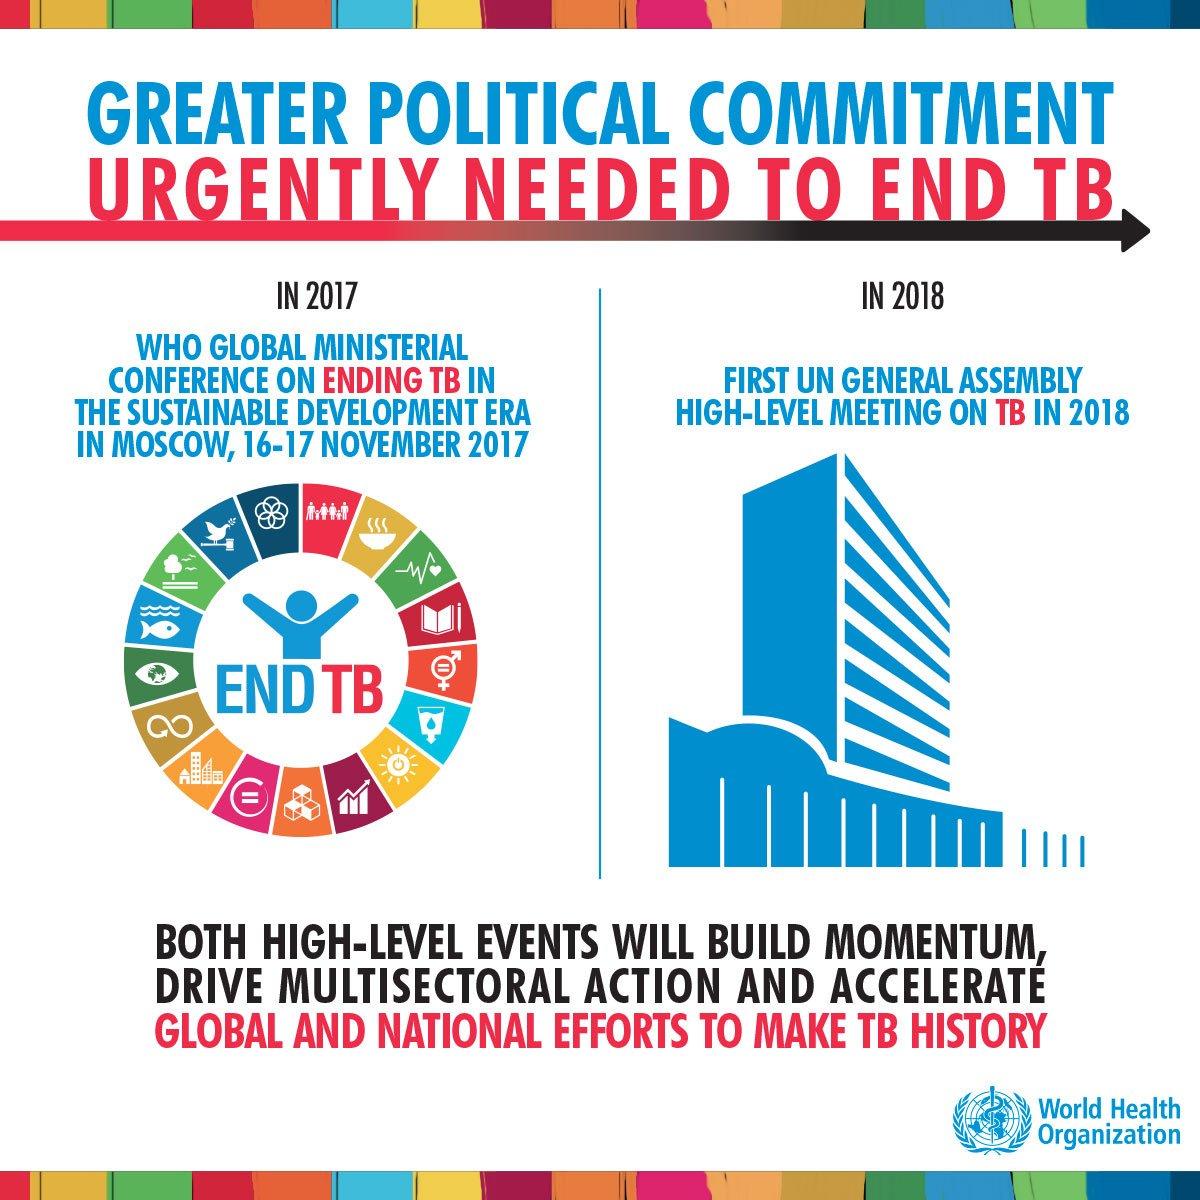 World Health Organization (WHO) on Twitter: